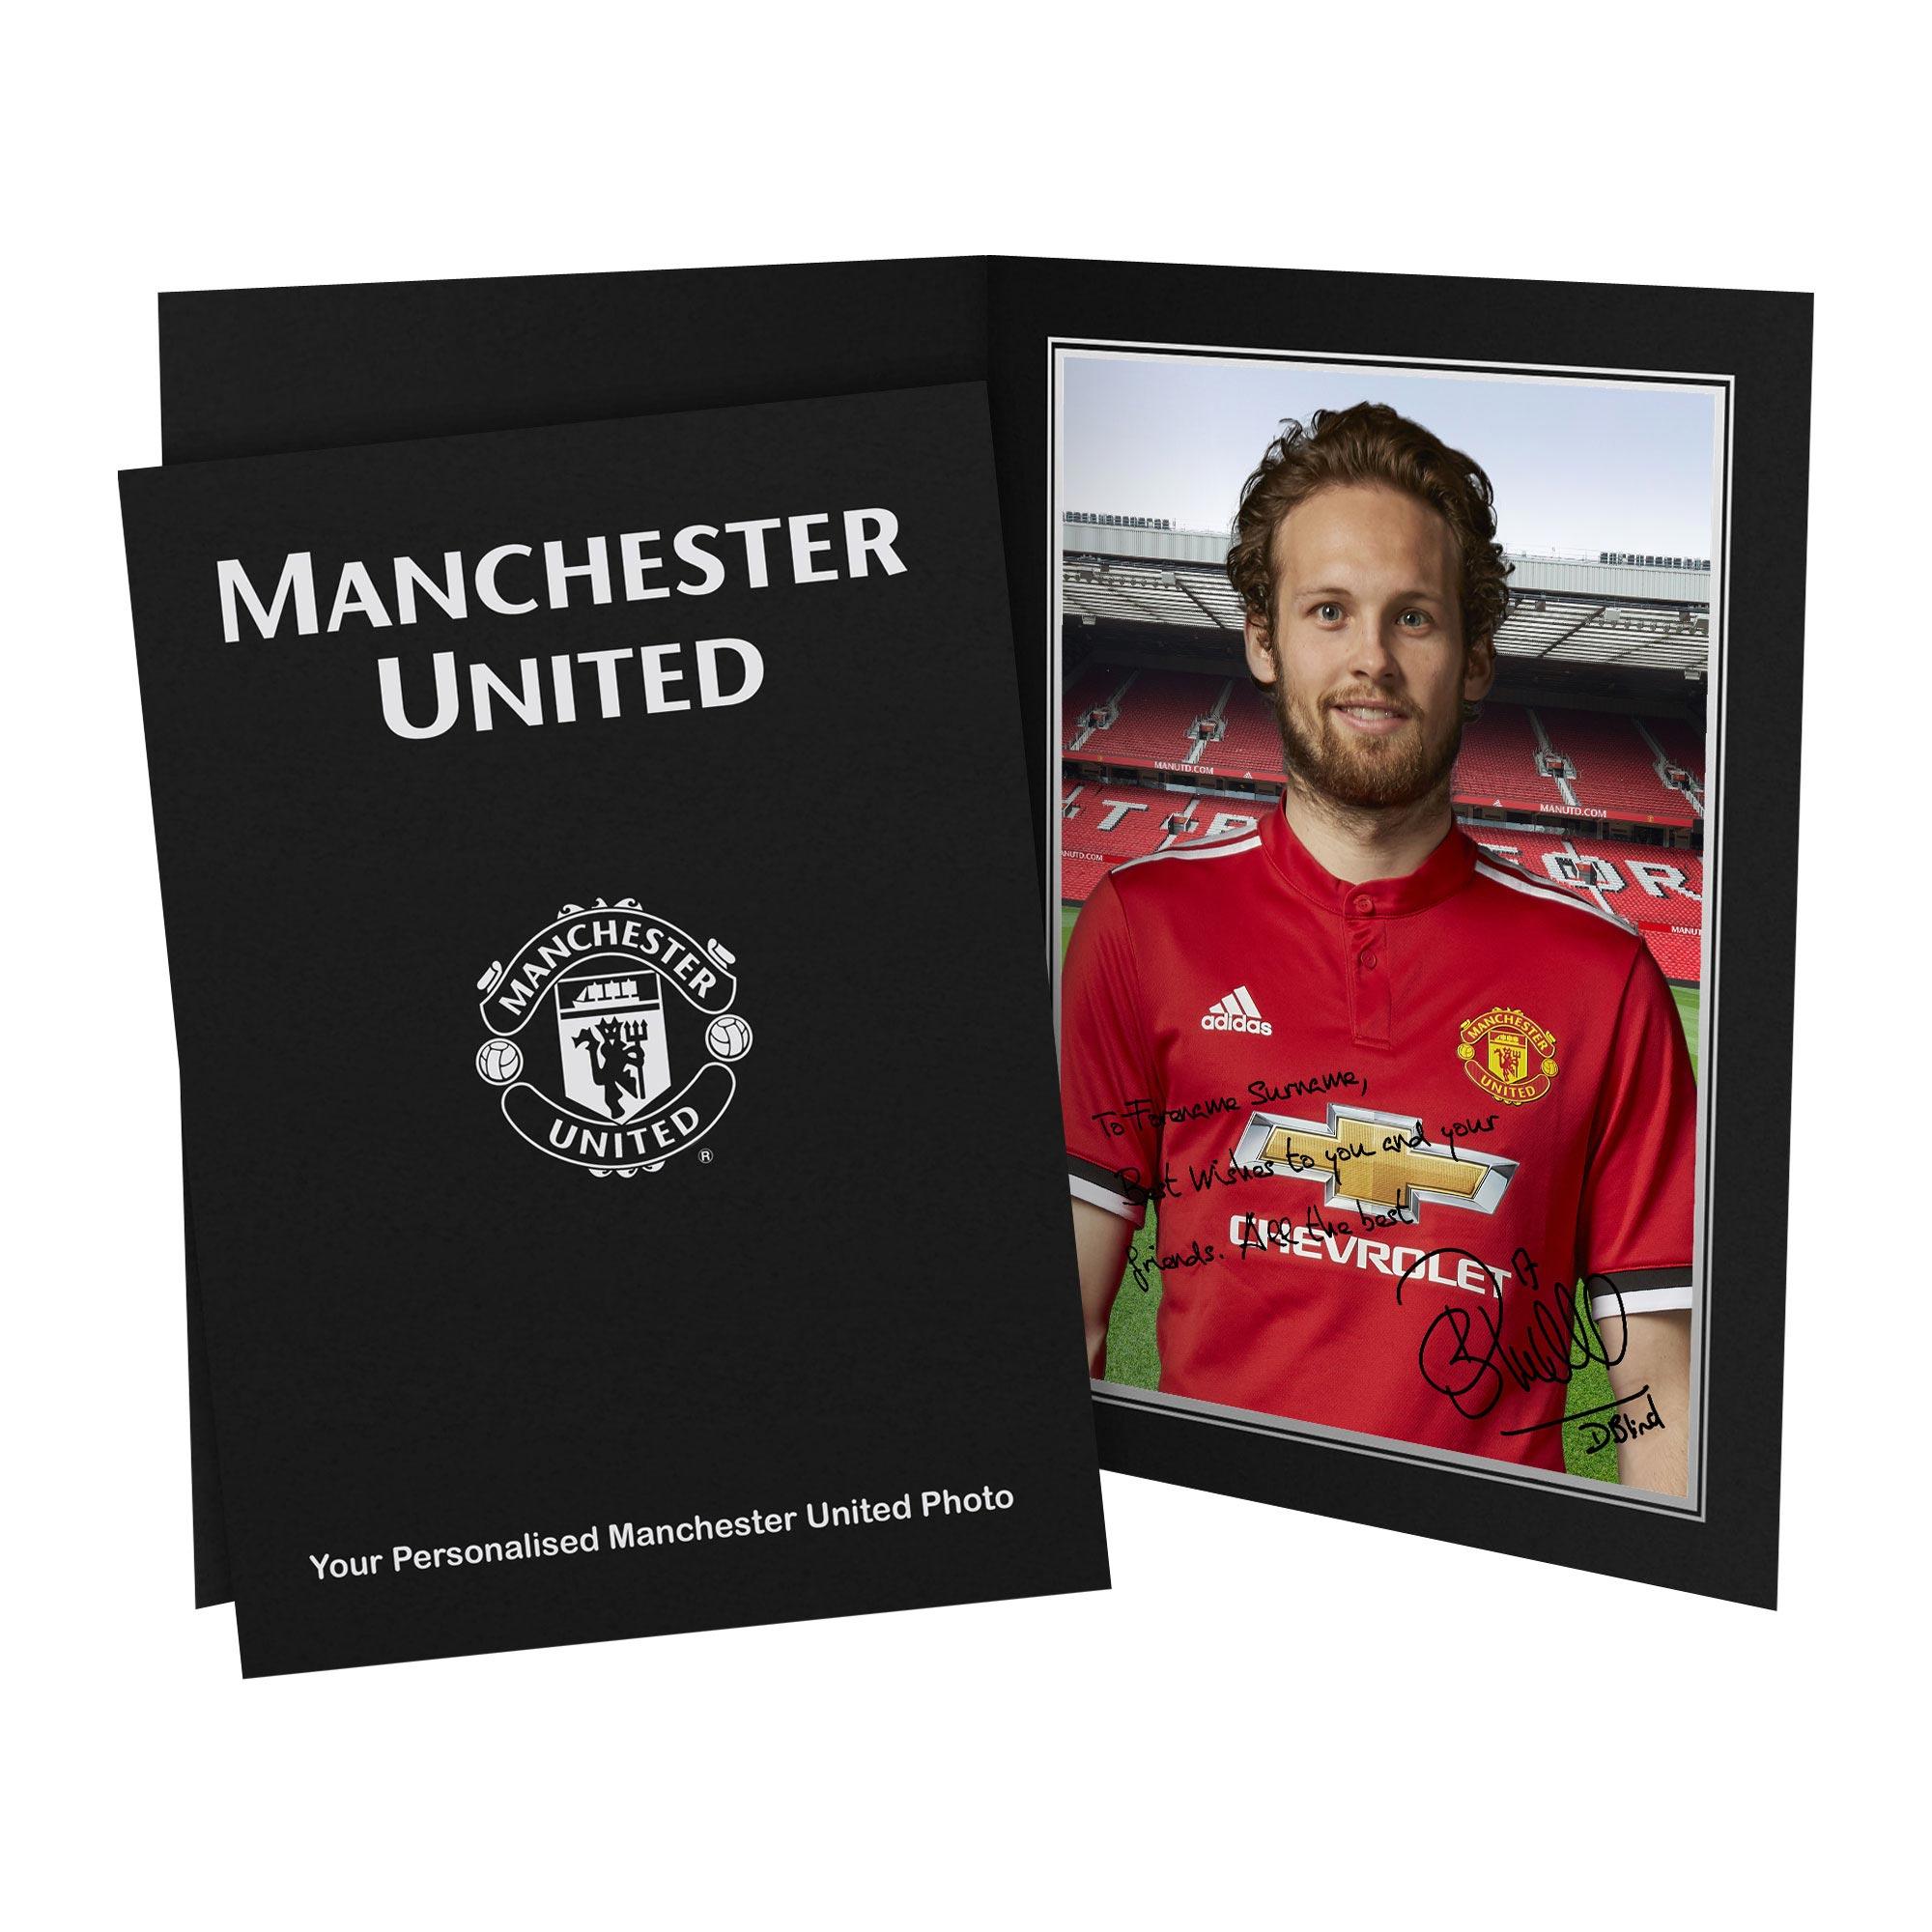 Manchester United Personalised Signature Photo in Presentation Folder - Blind